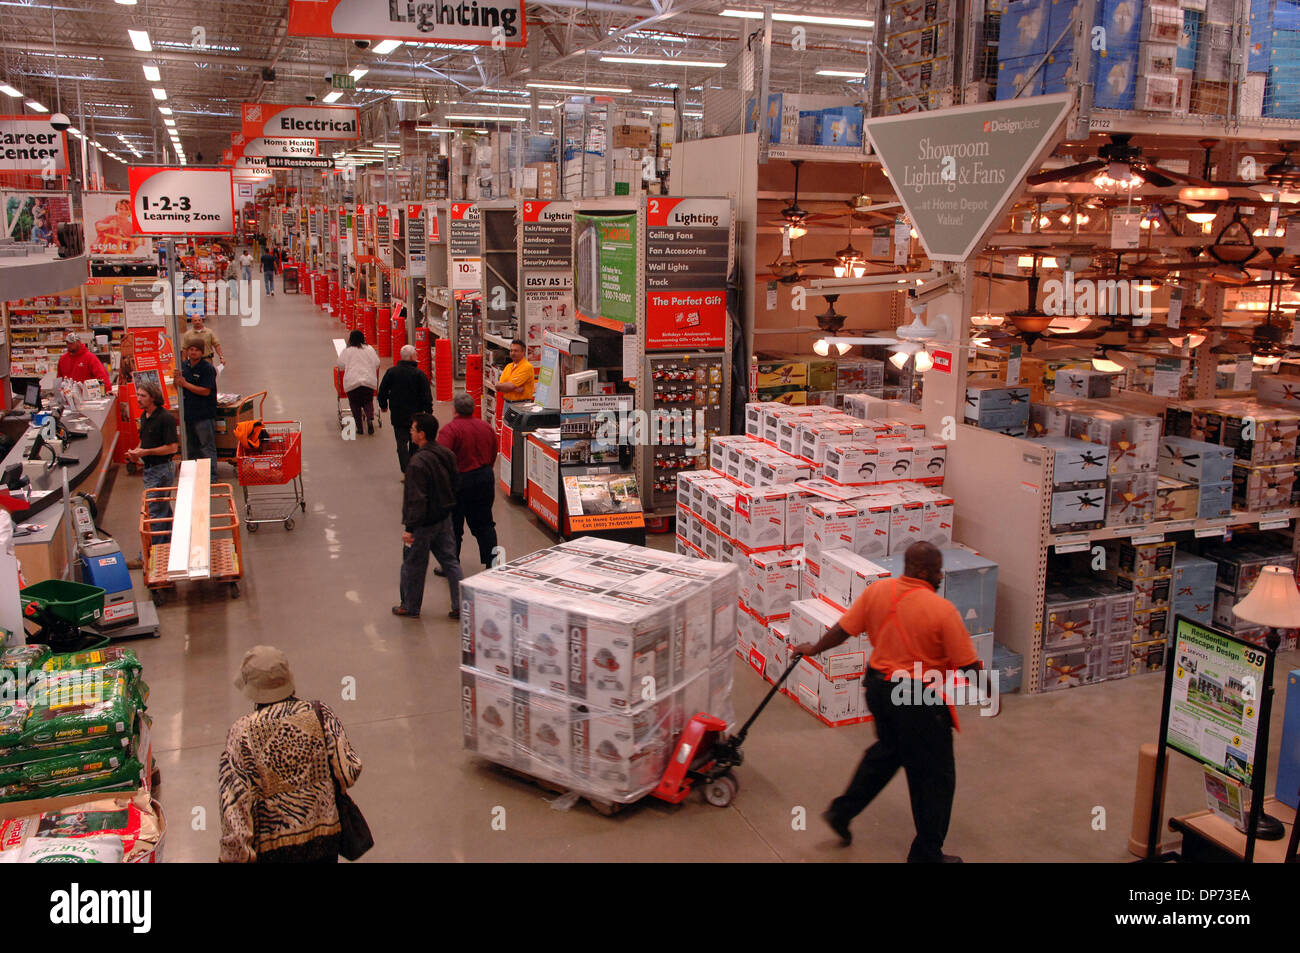 Home Depot Store Interior Stock Photos  Home Depot Store